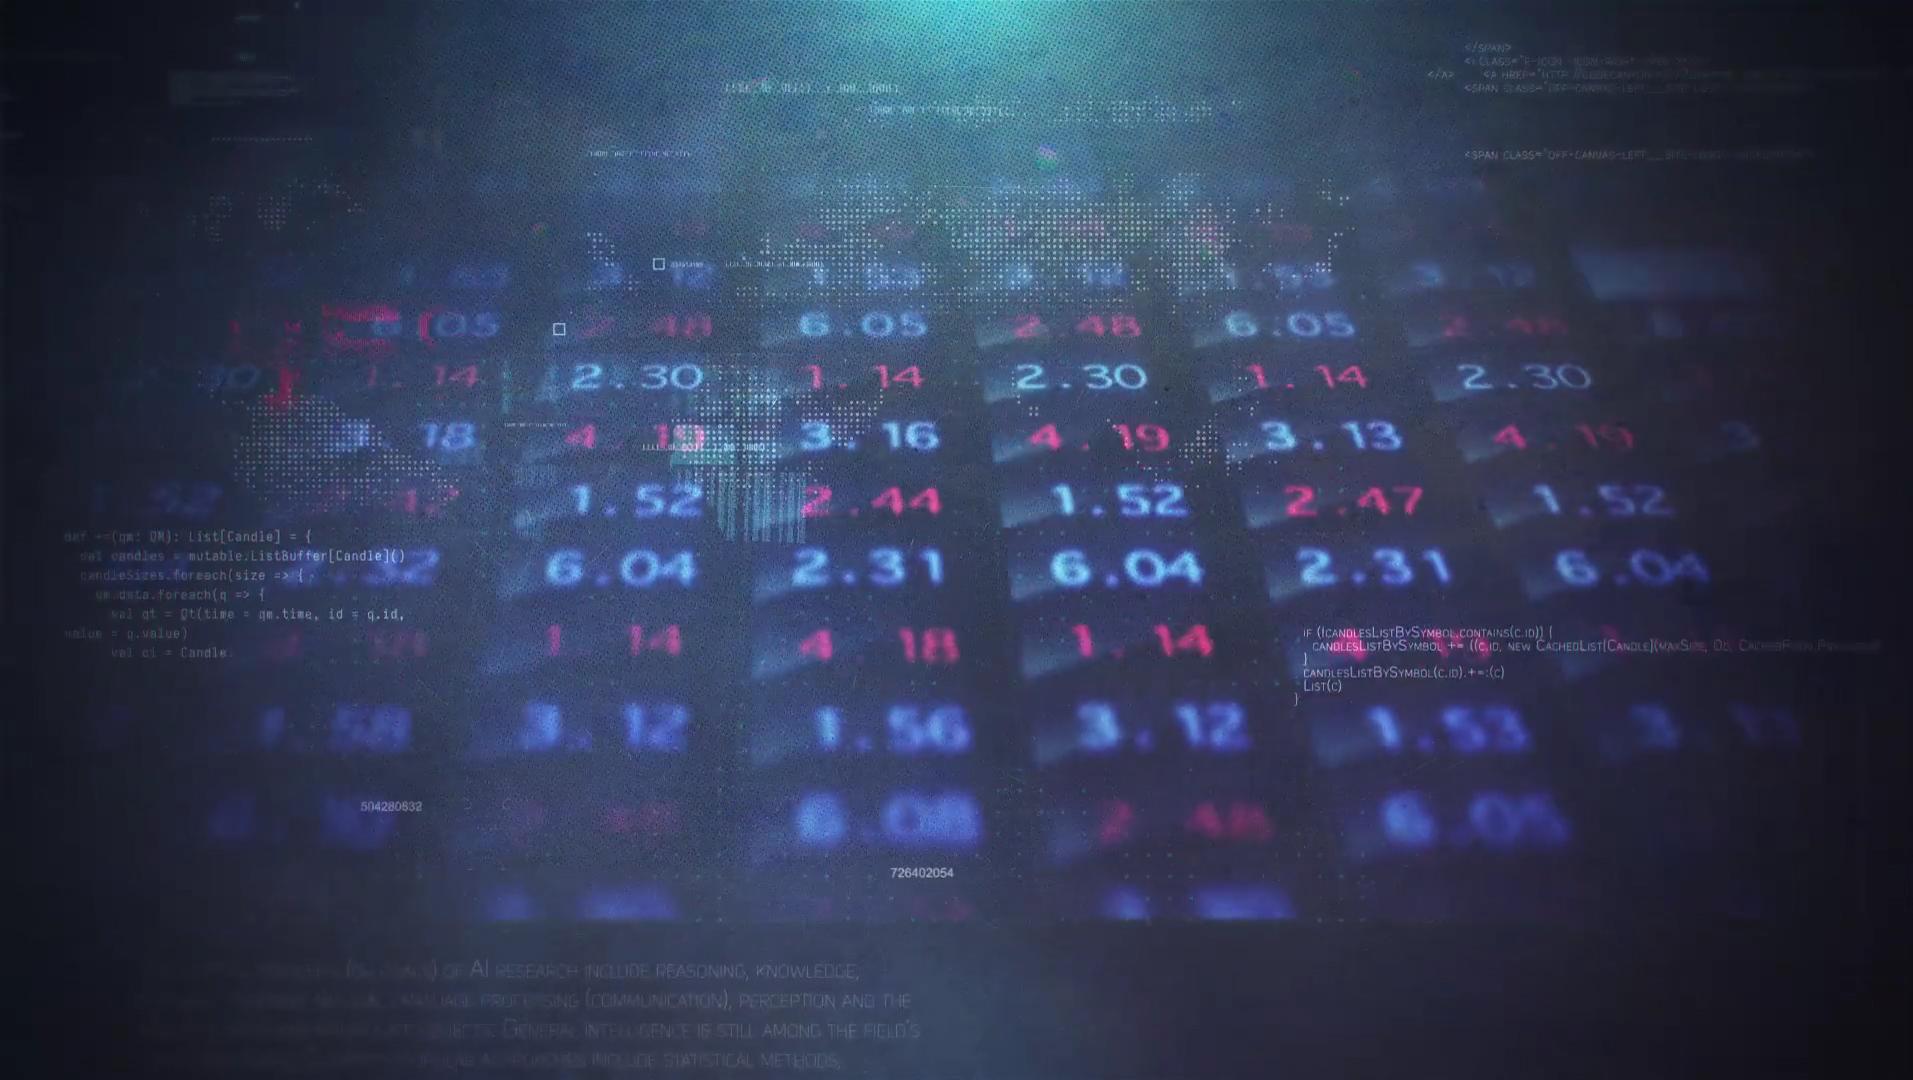 kriptovaluta kereskedési algoritmusok)